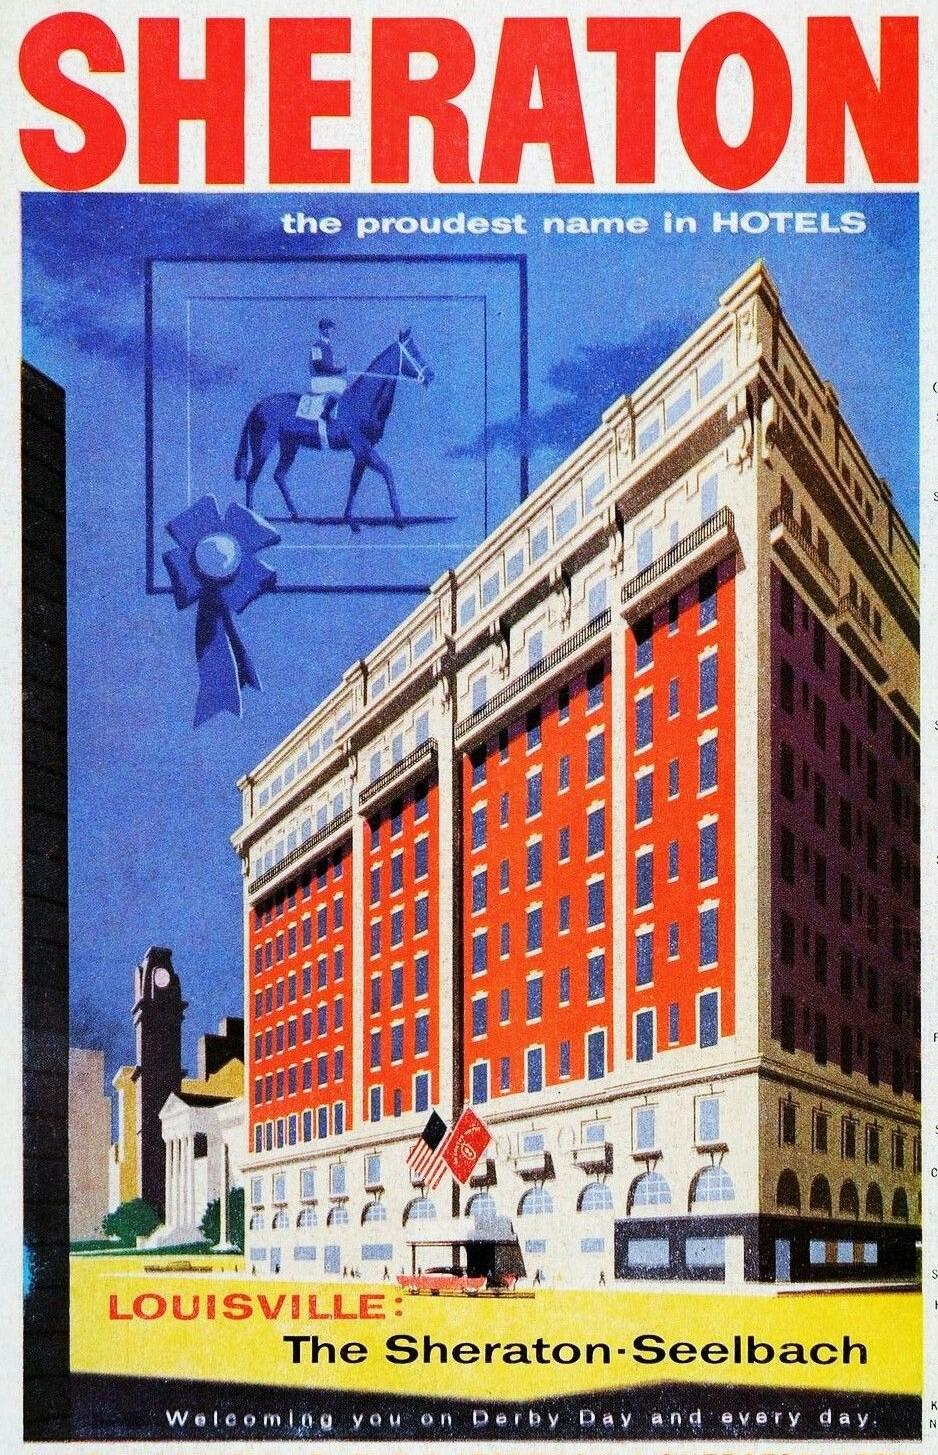 1956 - The Sheraton-Seelbach in Louisville